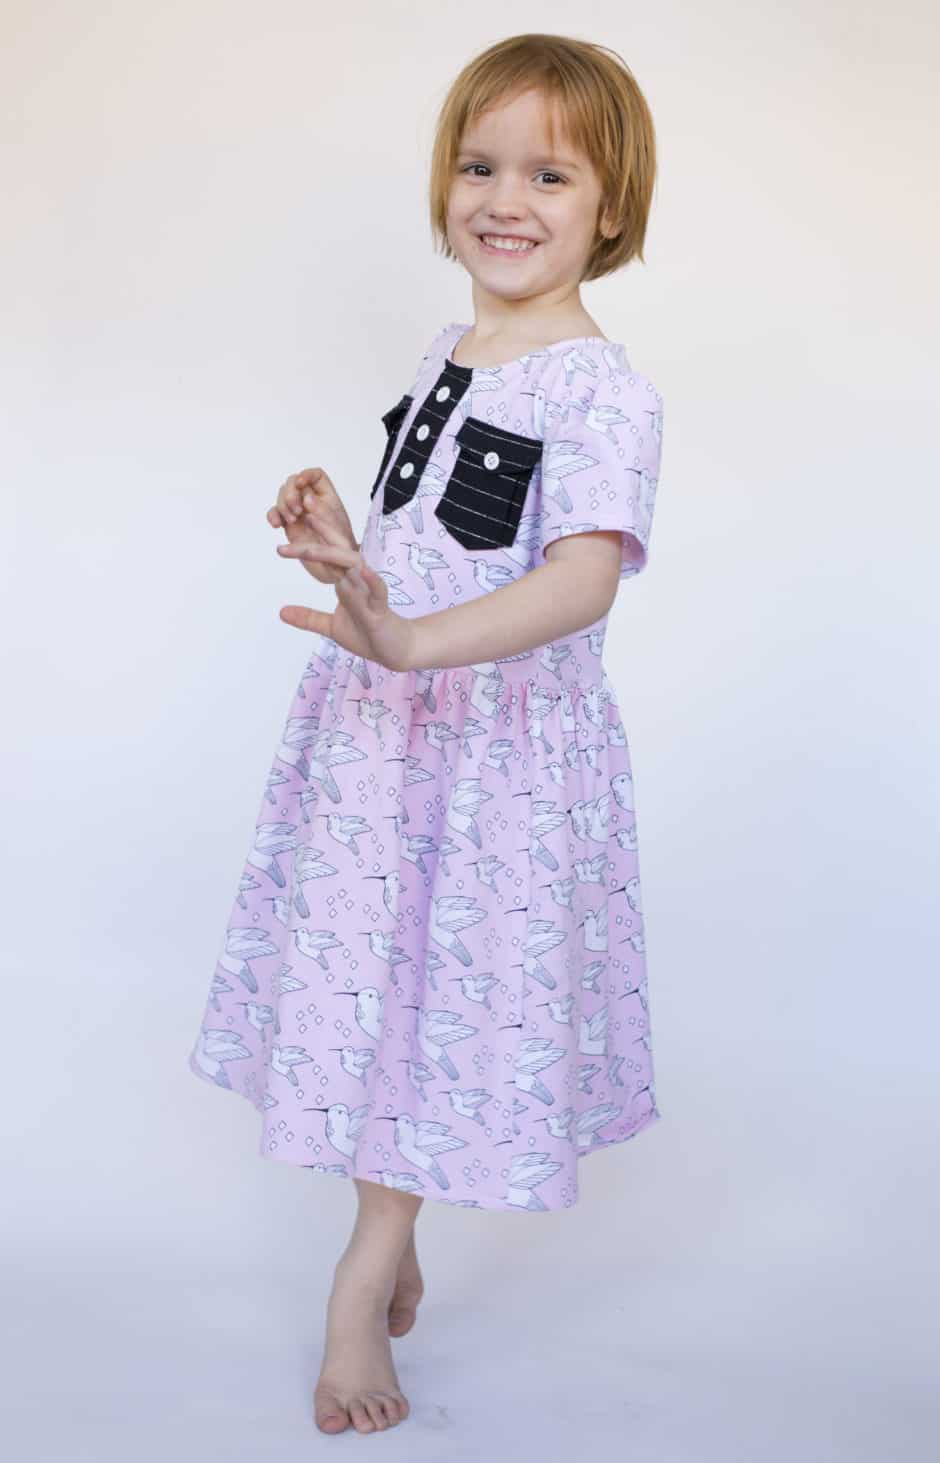 girl-stretch-dress